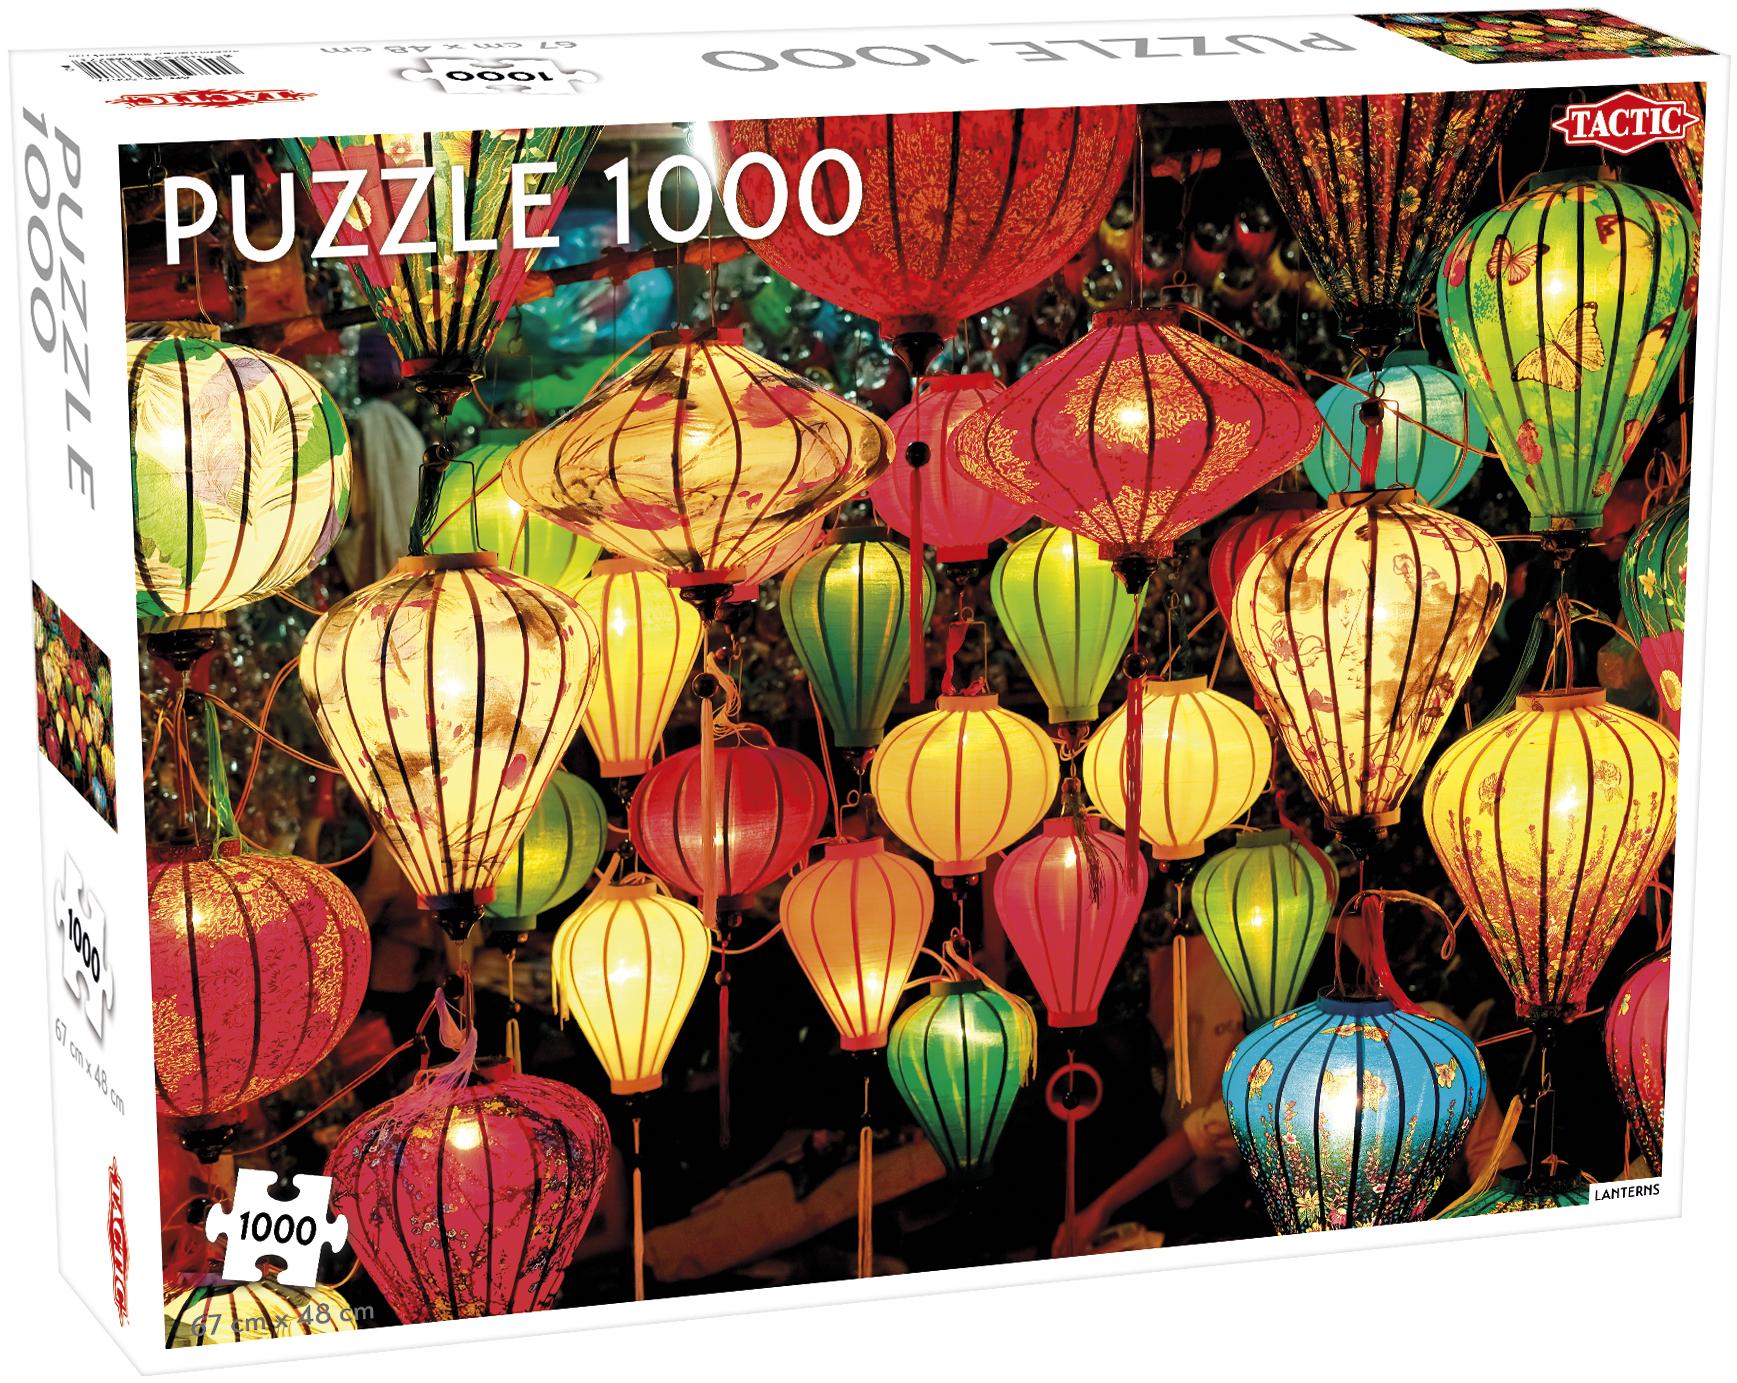 Tactic - Puzzle 1000 pc - Lanterns